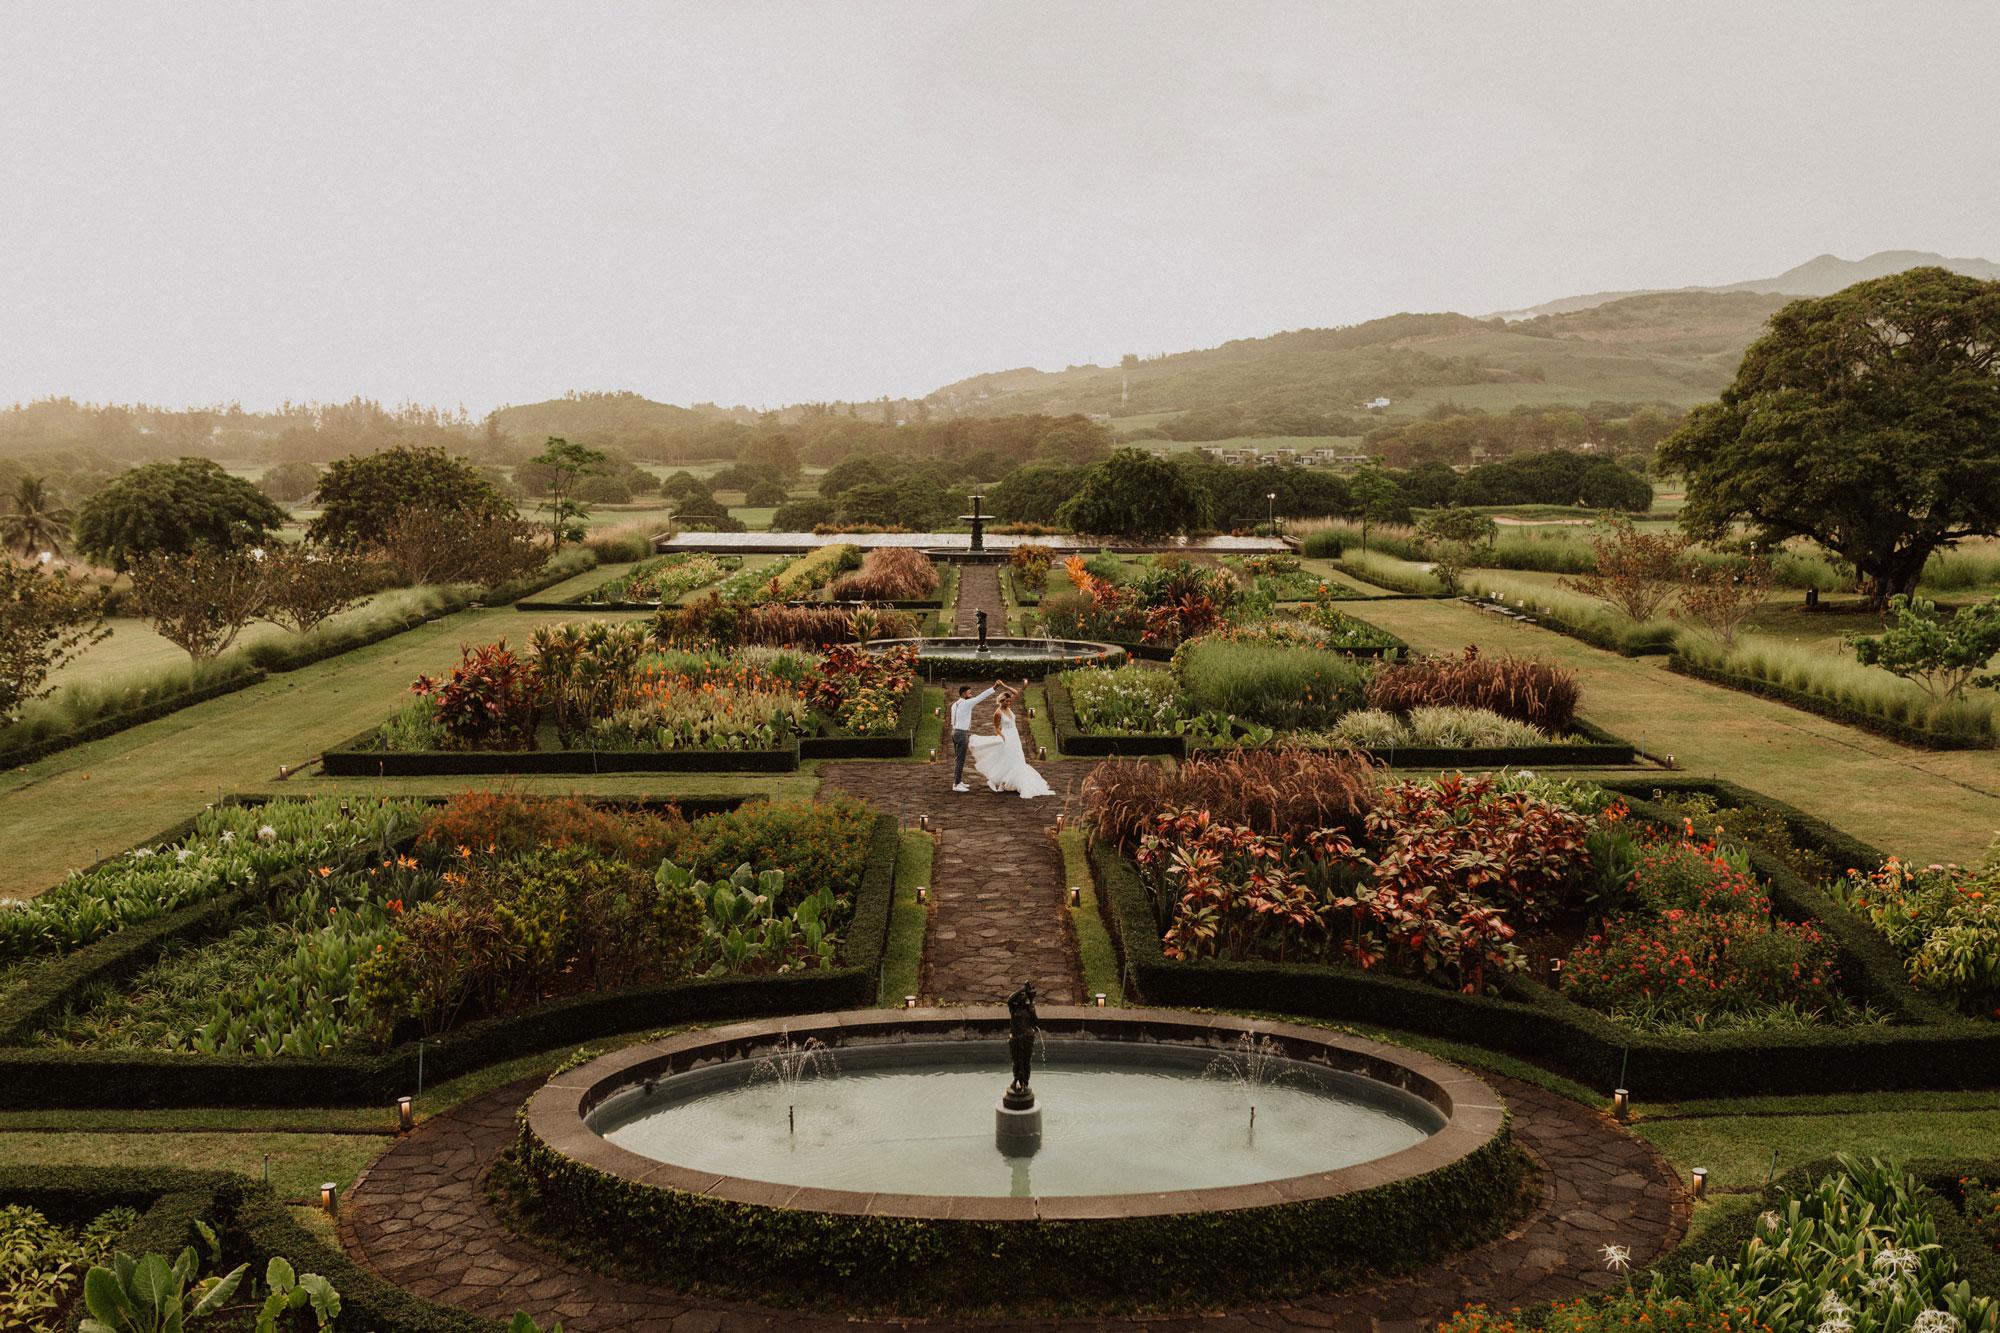 Destination wedding in Mauritius